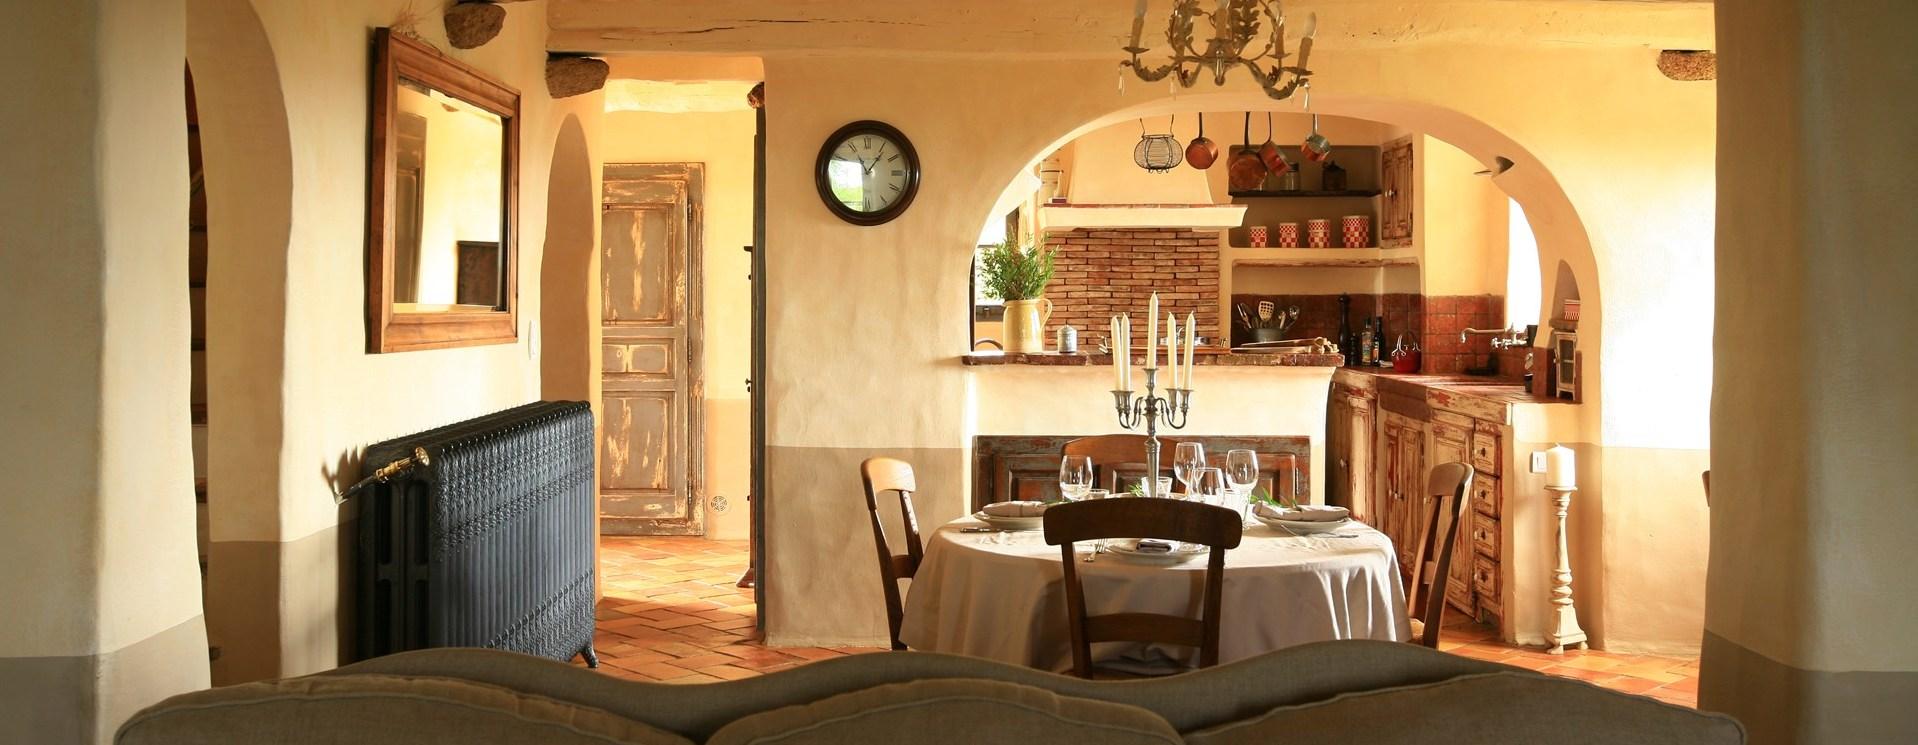 5-bedroom-villa-eddera-corsica-kitchen